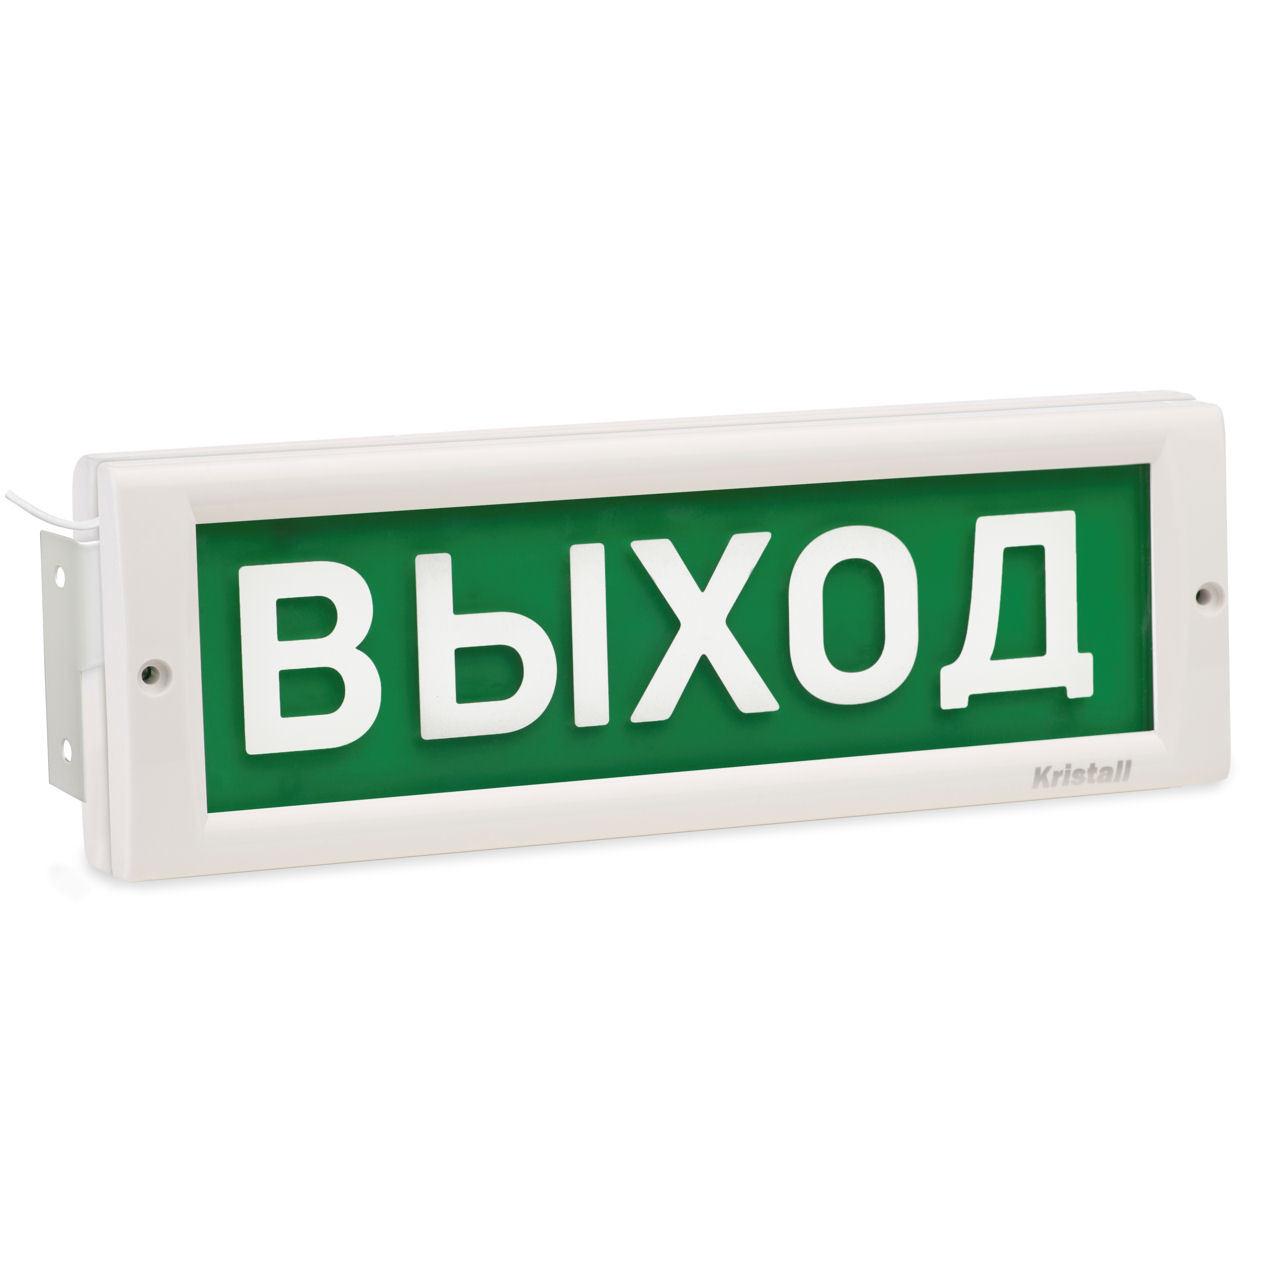 Двухстороннее световое табло «Выход» КРИСТАЛЛ-12-Д / КРИСТАЛЛ-24-Д